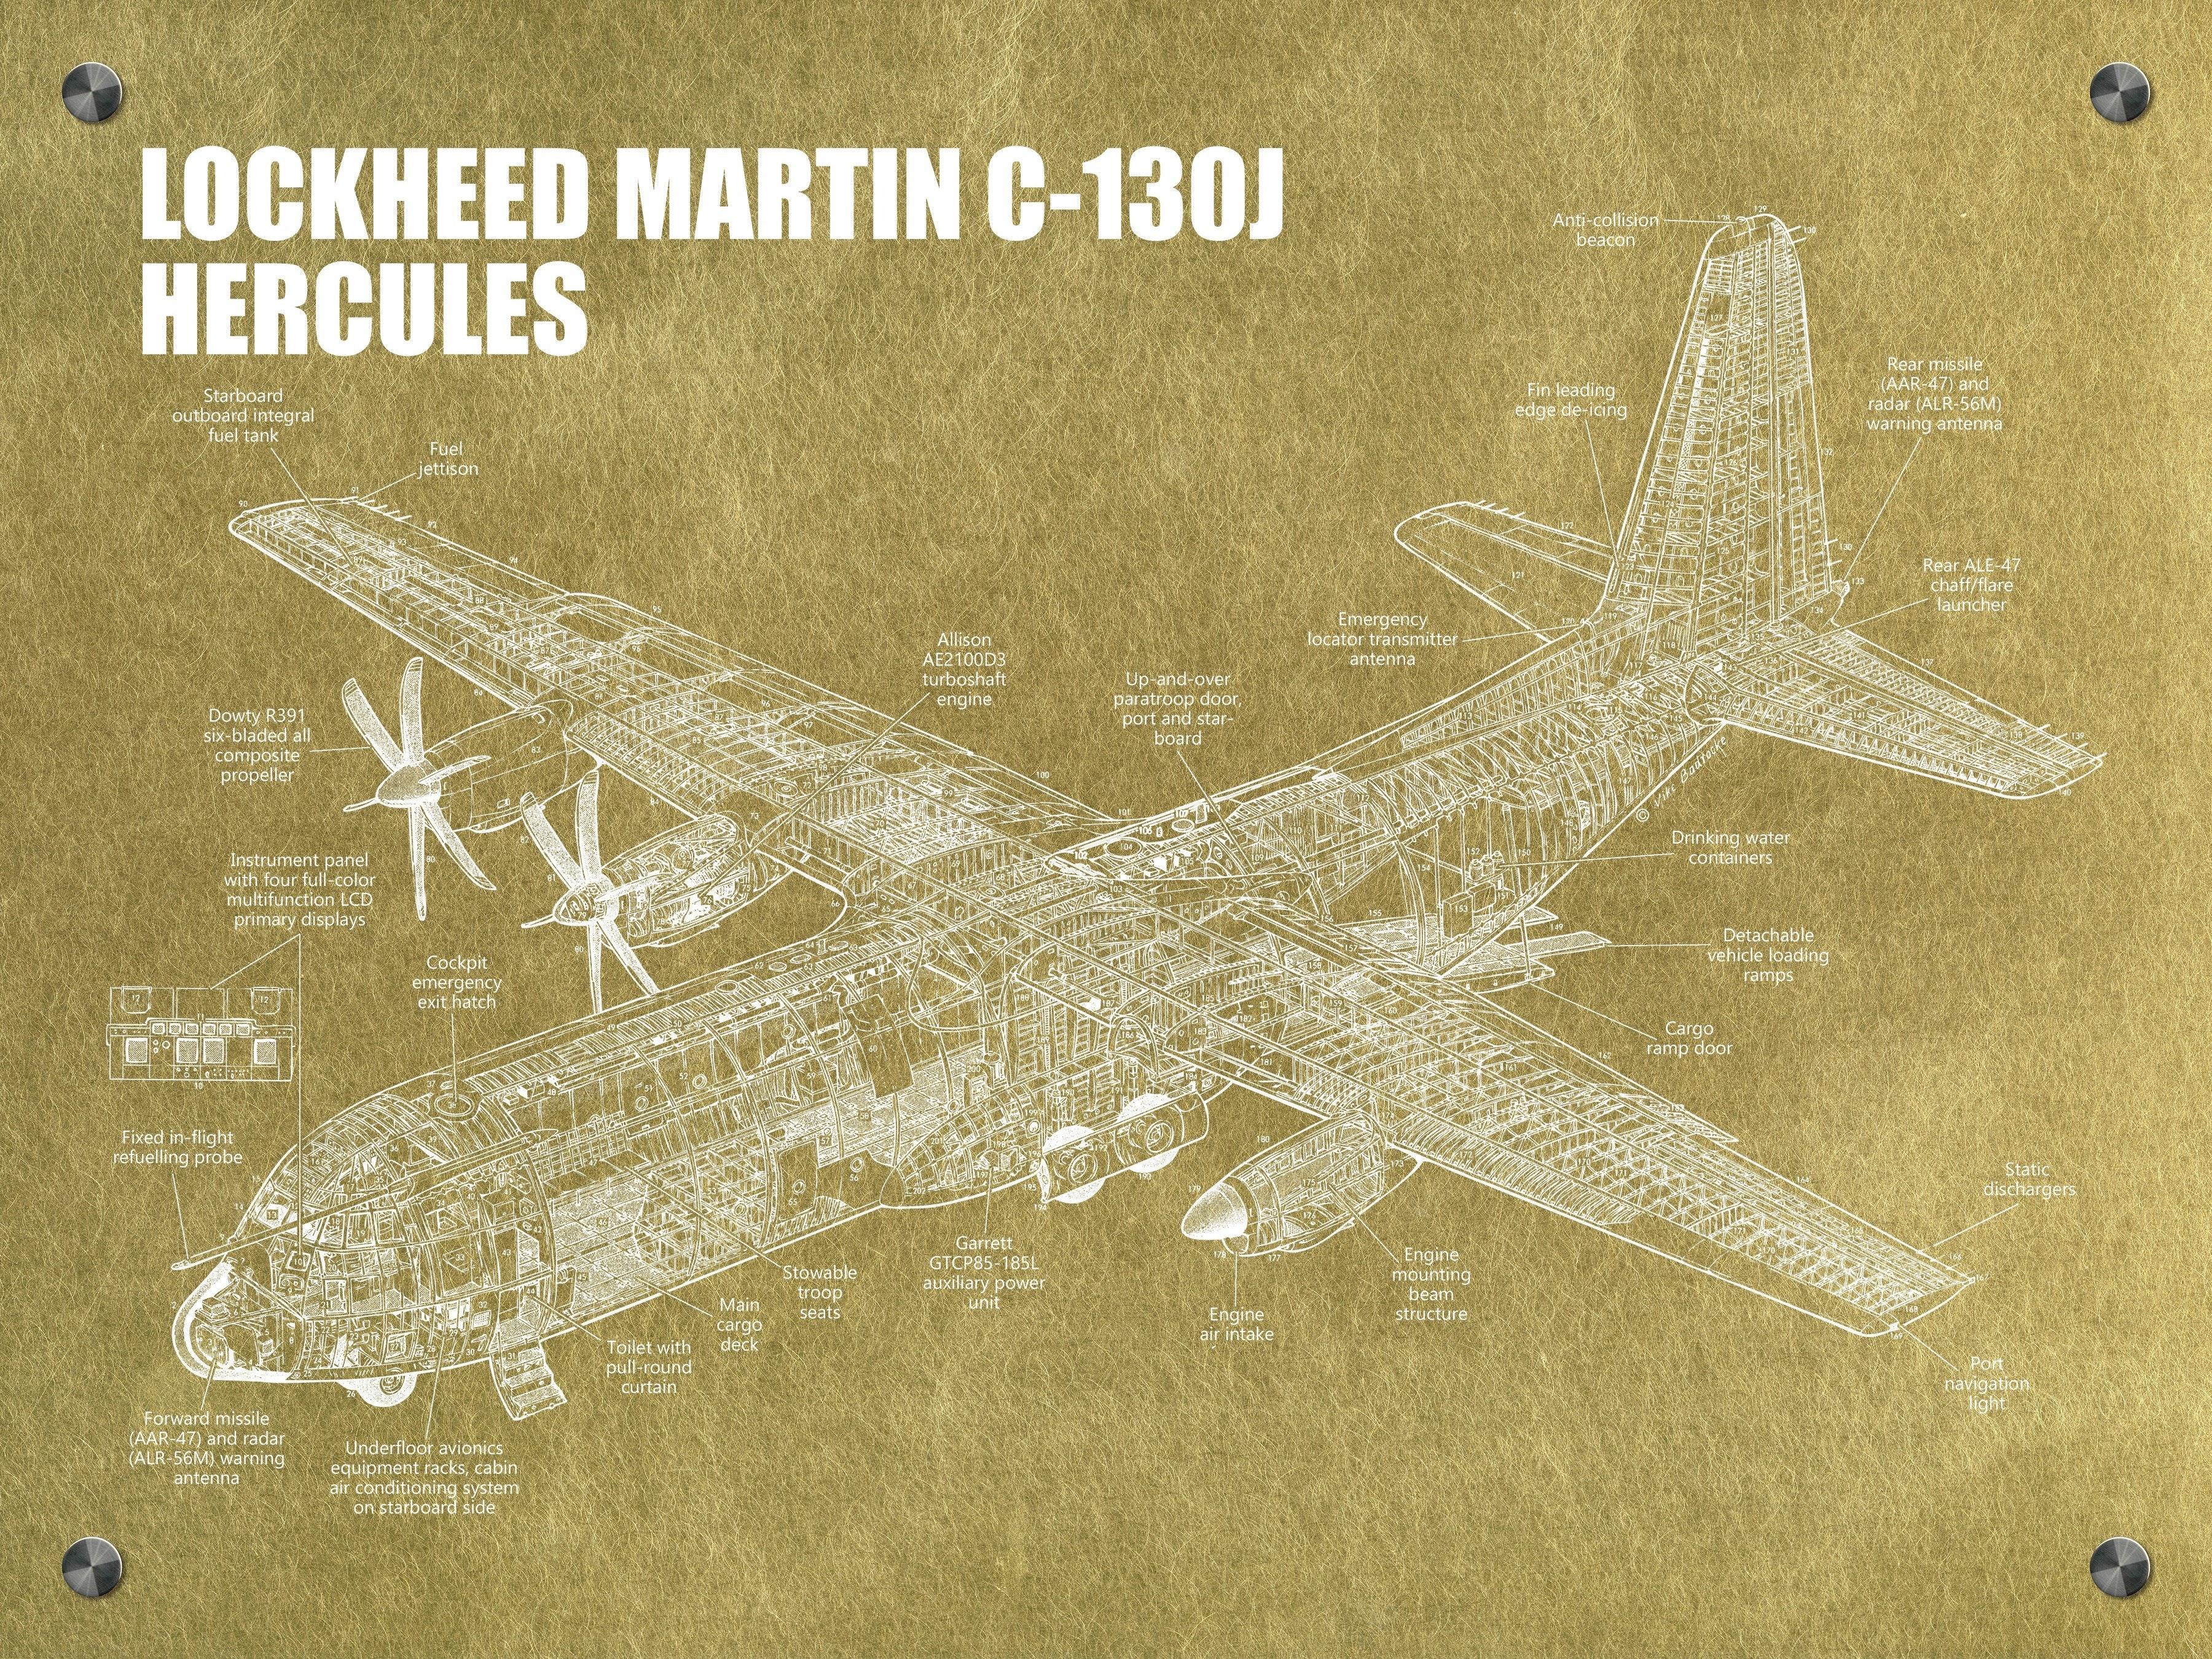 Lockheed Martin C-13Oj Hercules